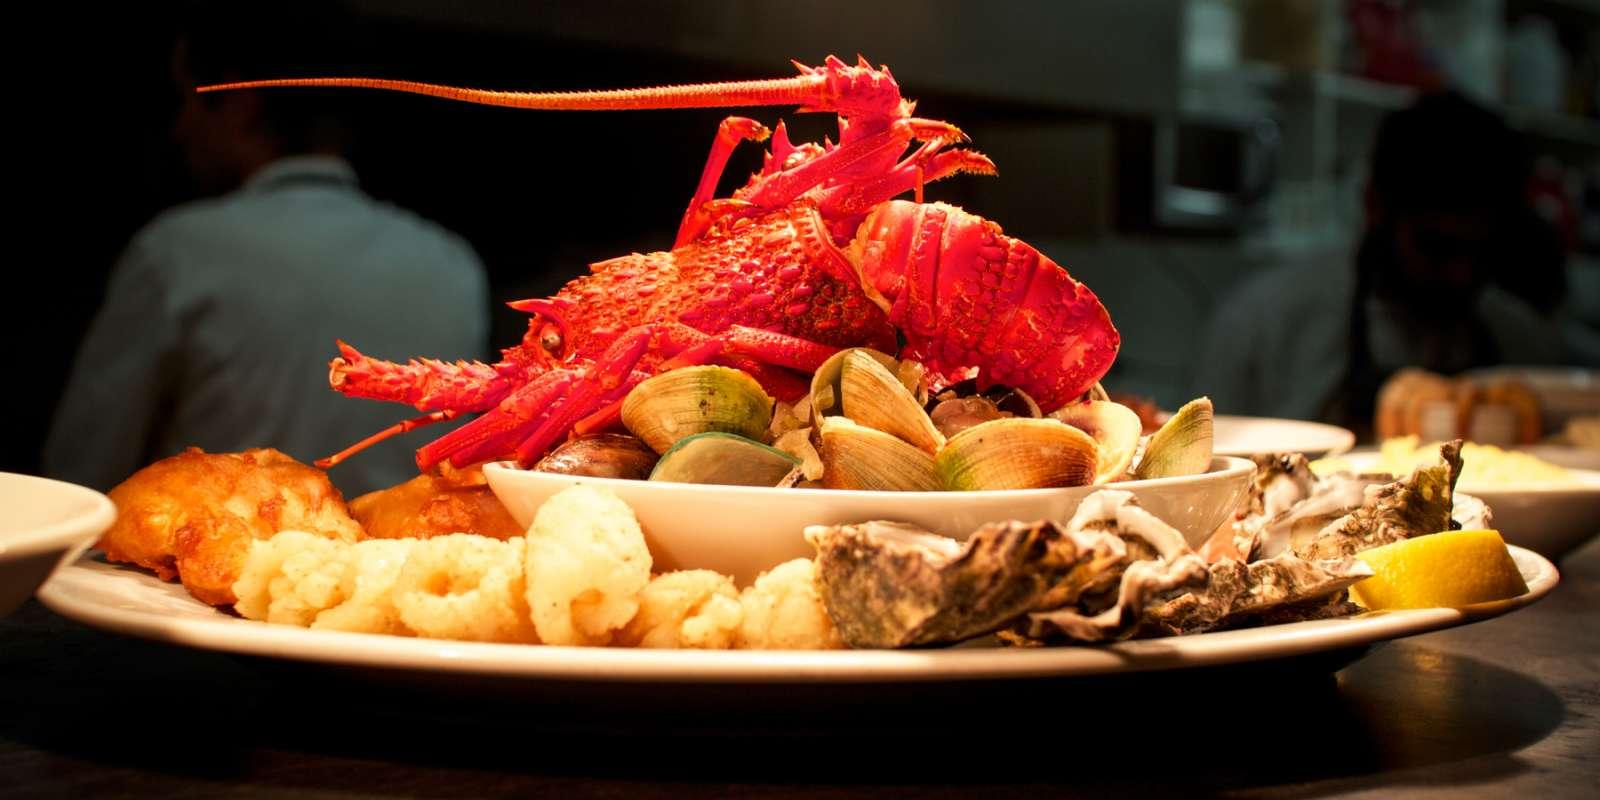 Fresh crayfish at Finz Seafood & Grill